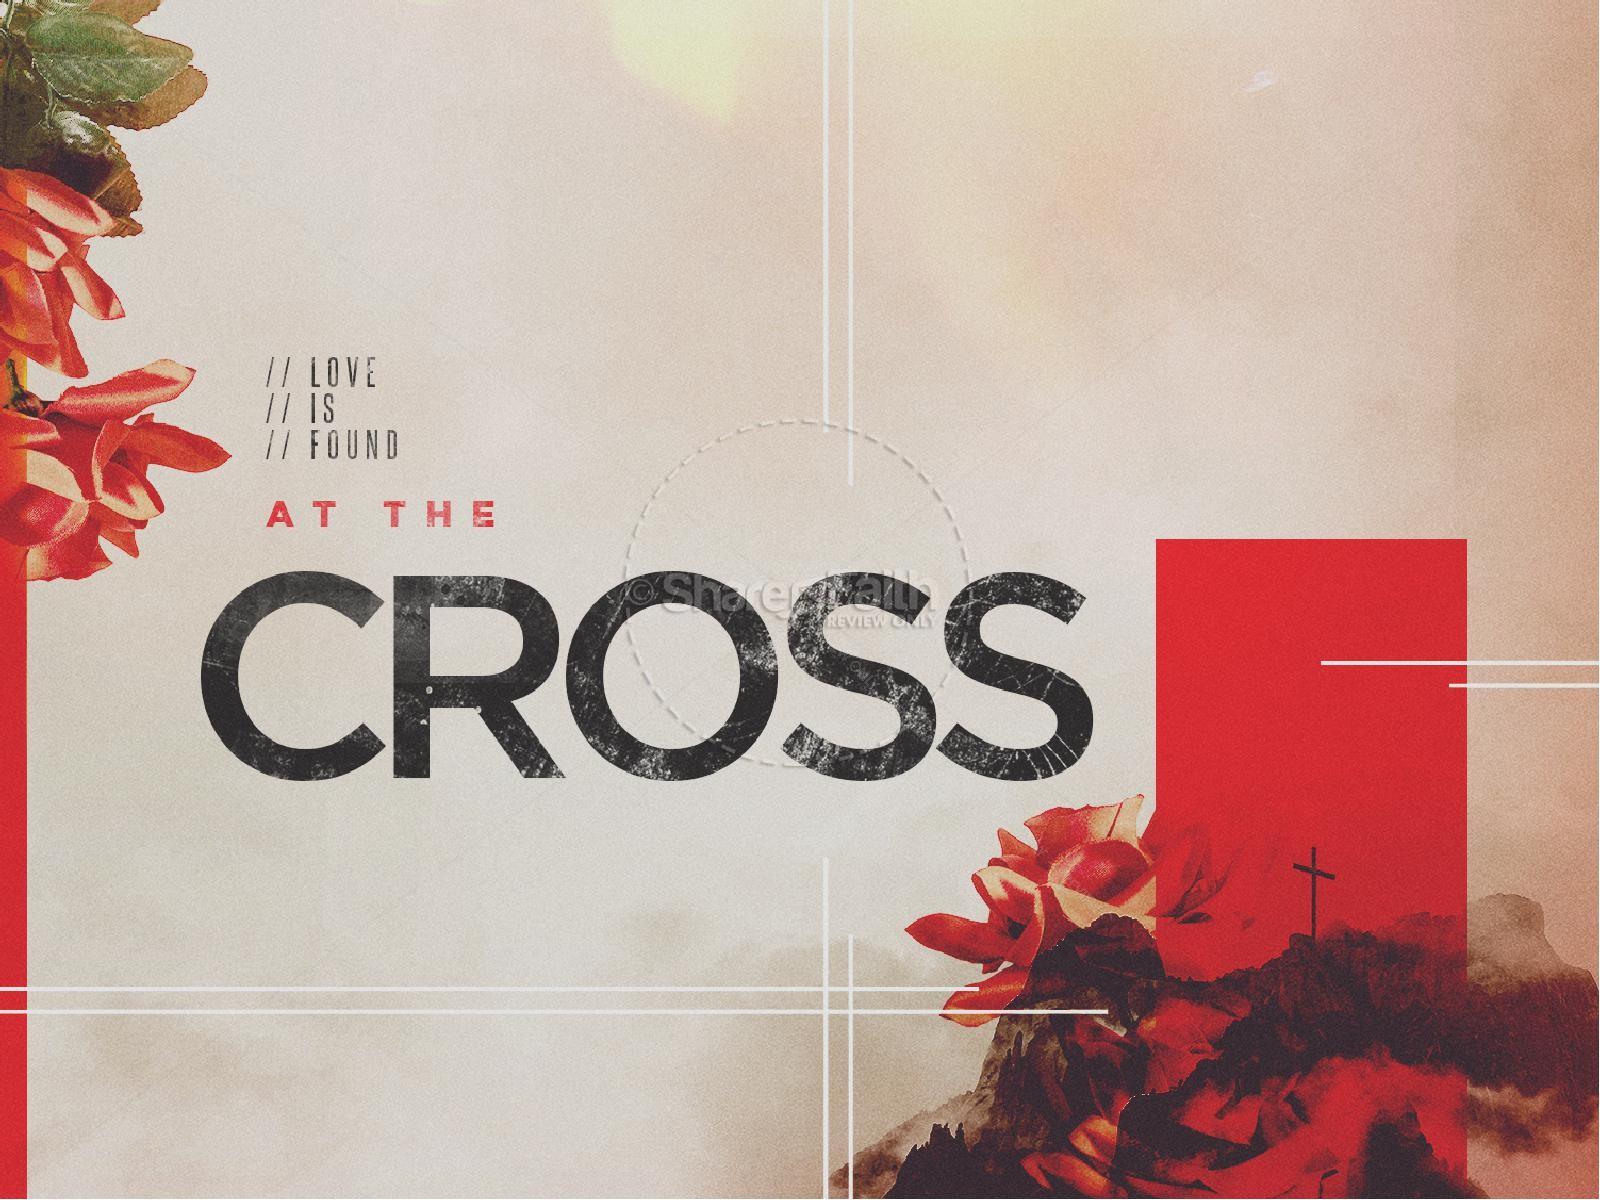 At The Cross Sermon Title Graphic | slide 1